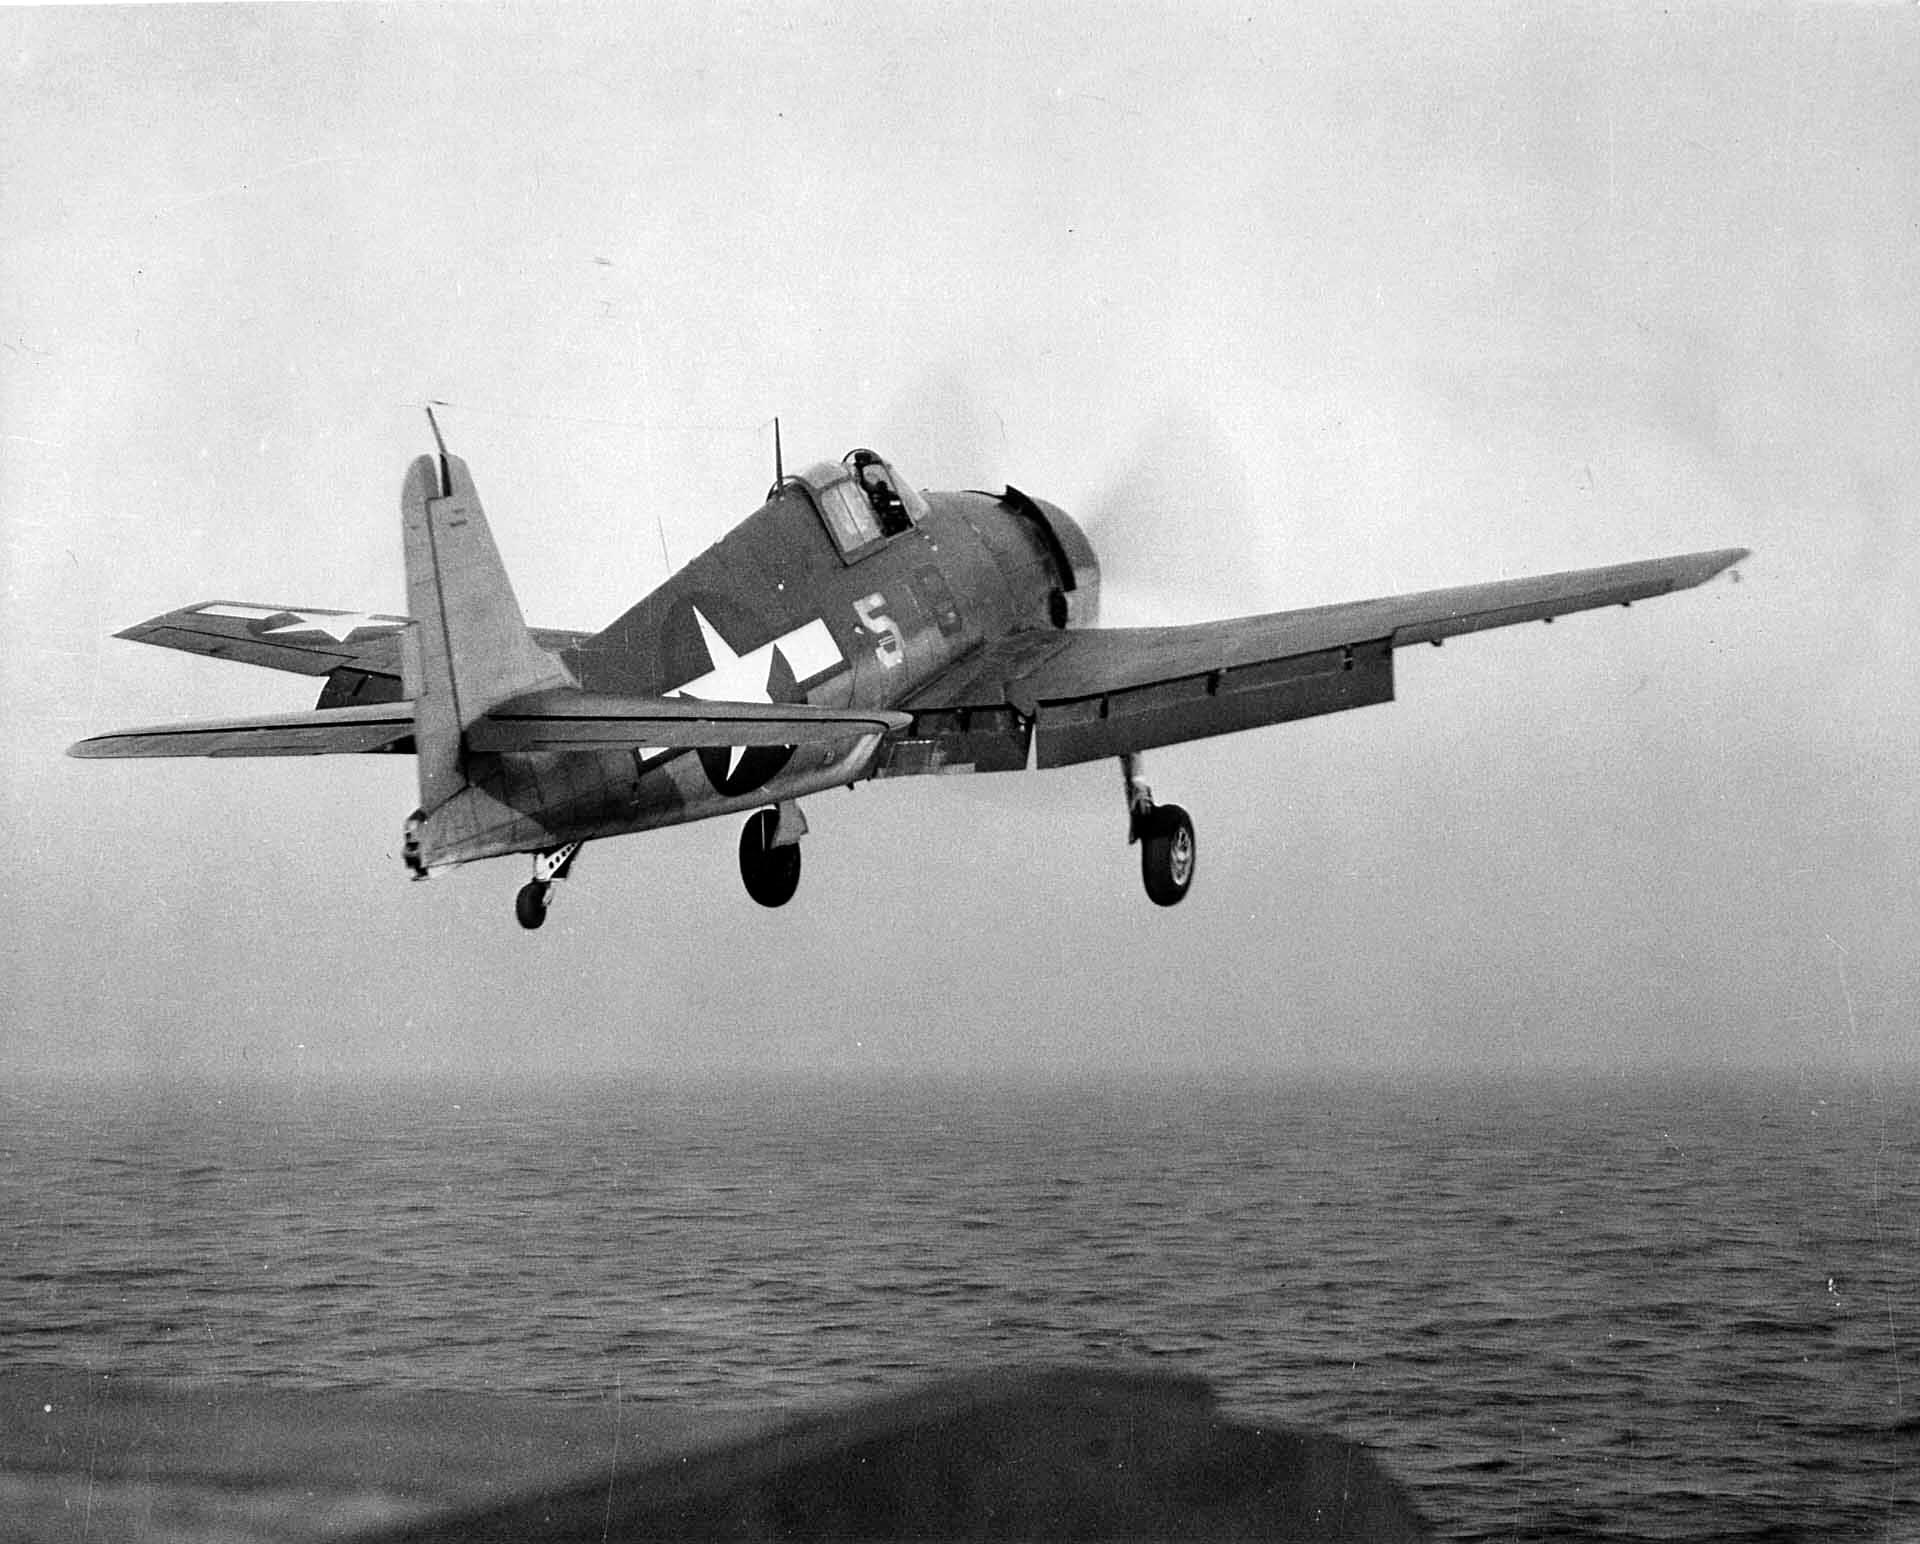 Grumman F6F 3 Hellcat VF 50 White 5 launched from CVL 29 USS Bataan off Chesapeake Bay Jan 1944 01